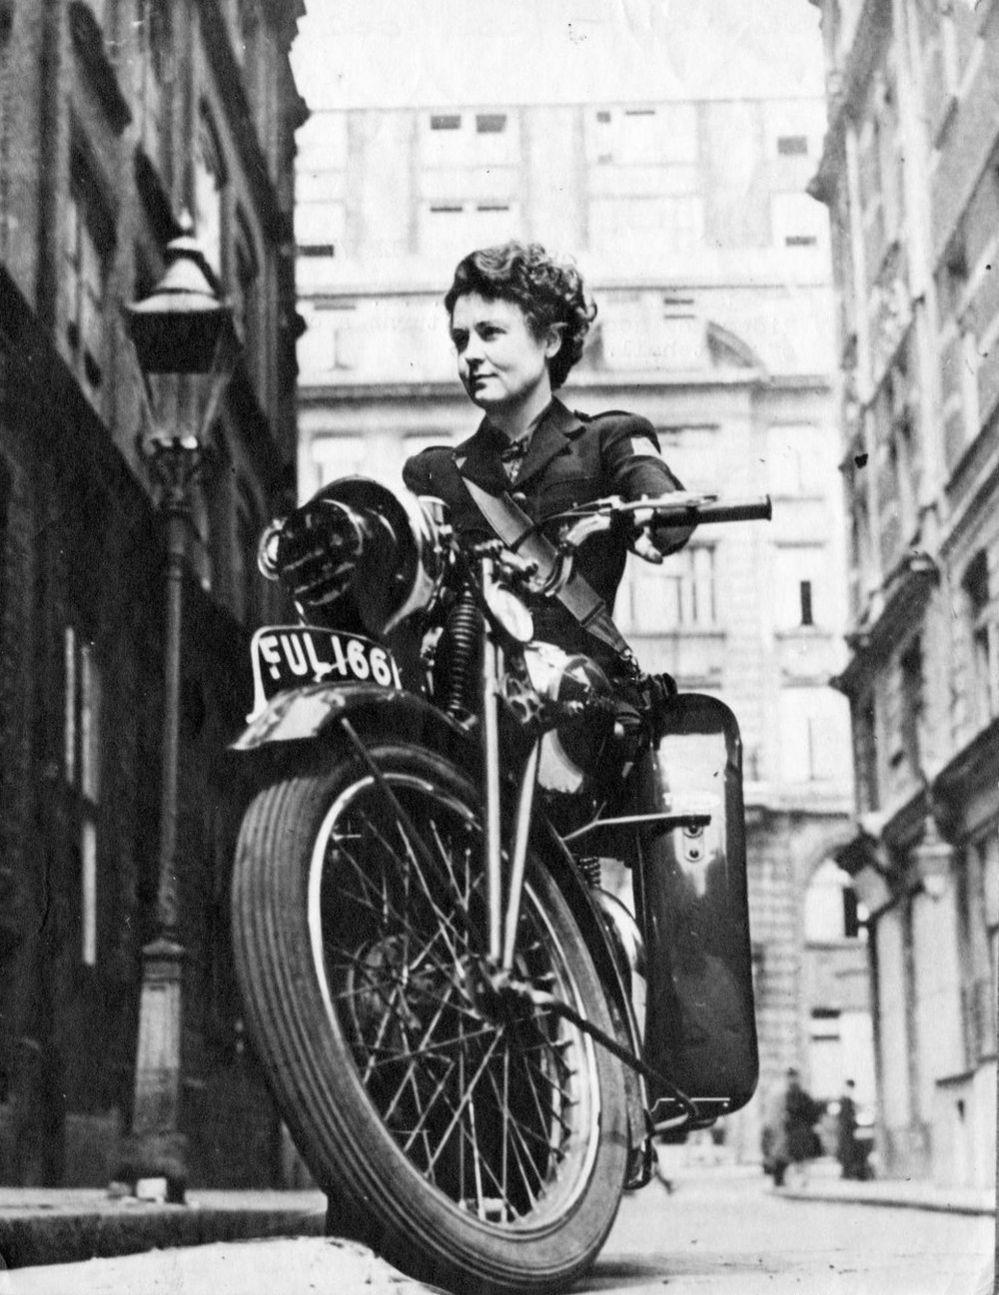 'Miss Mercury' of the WVS – Whitehall, London